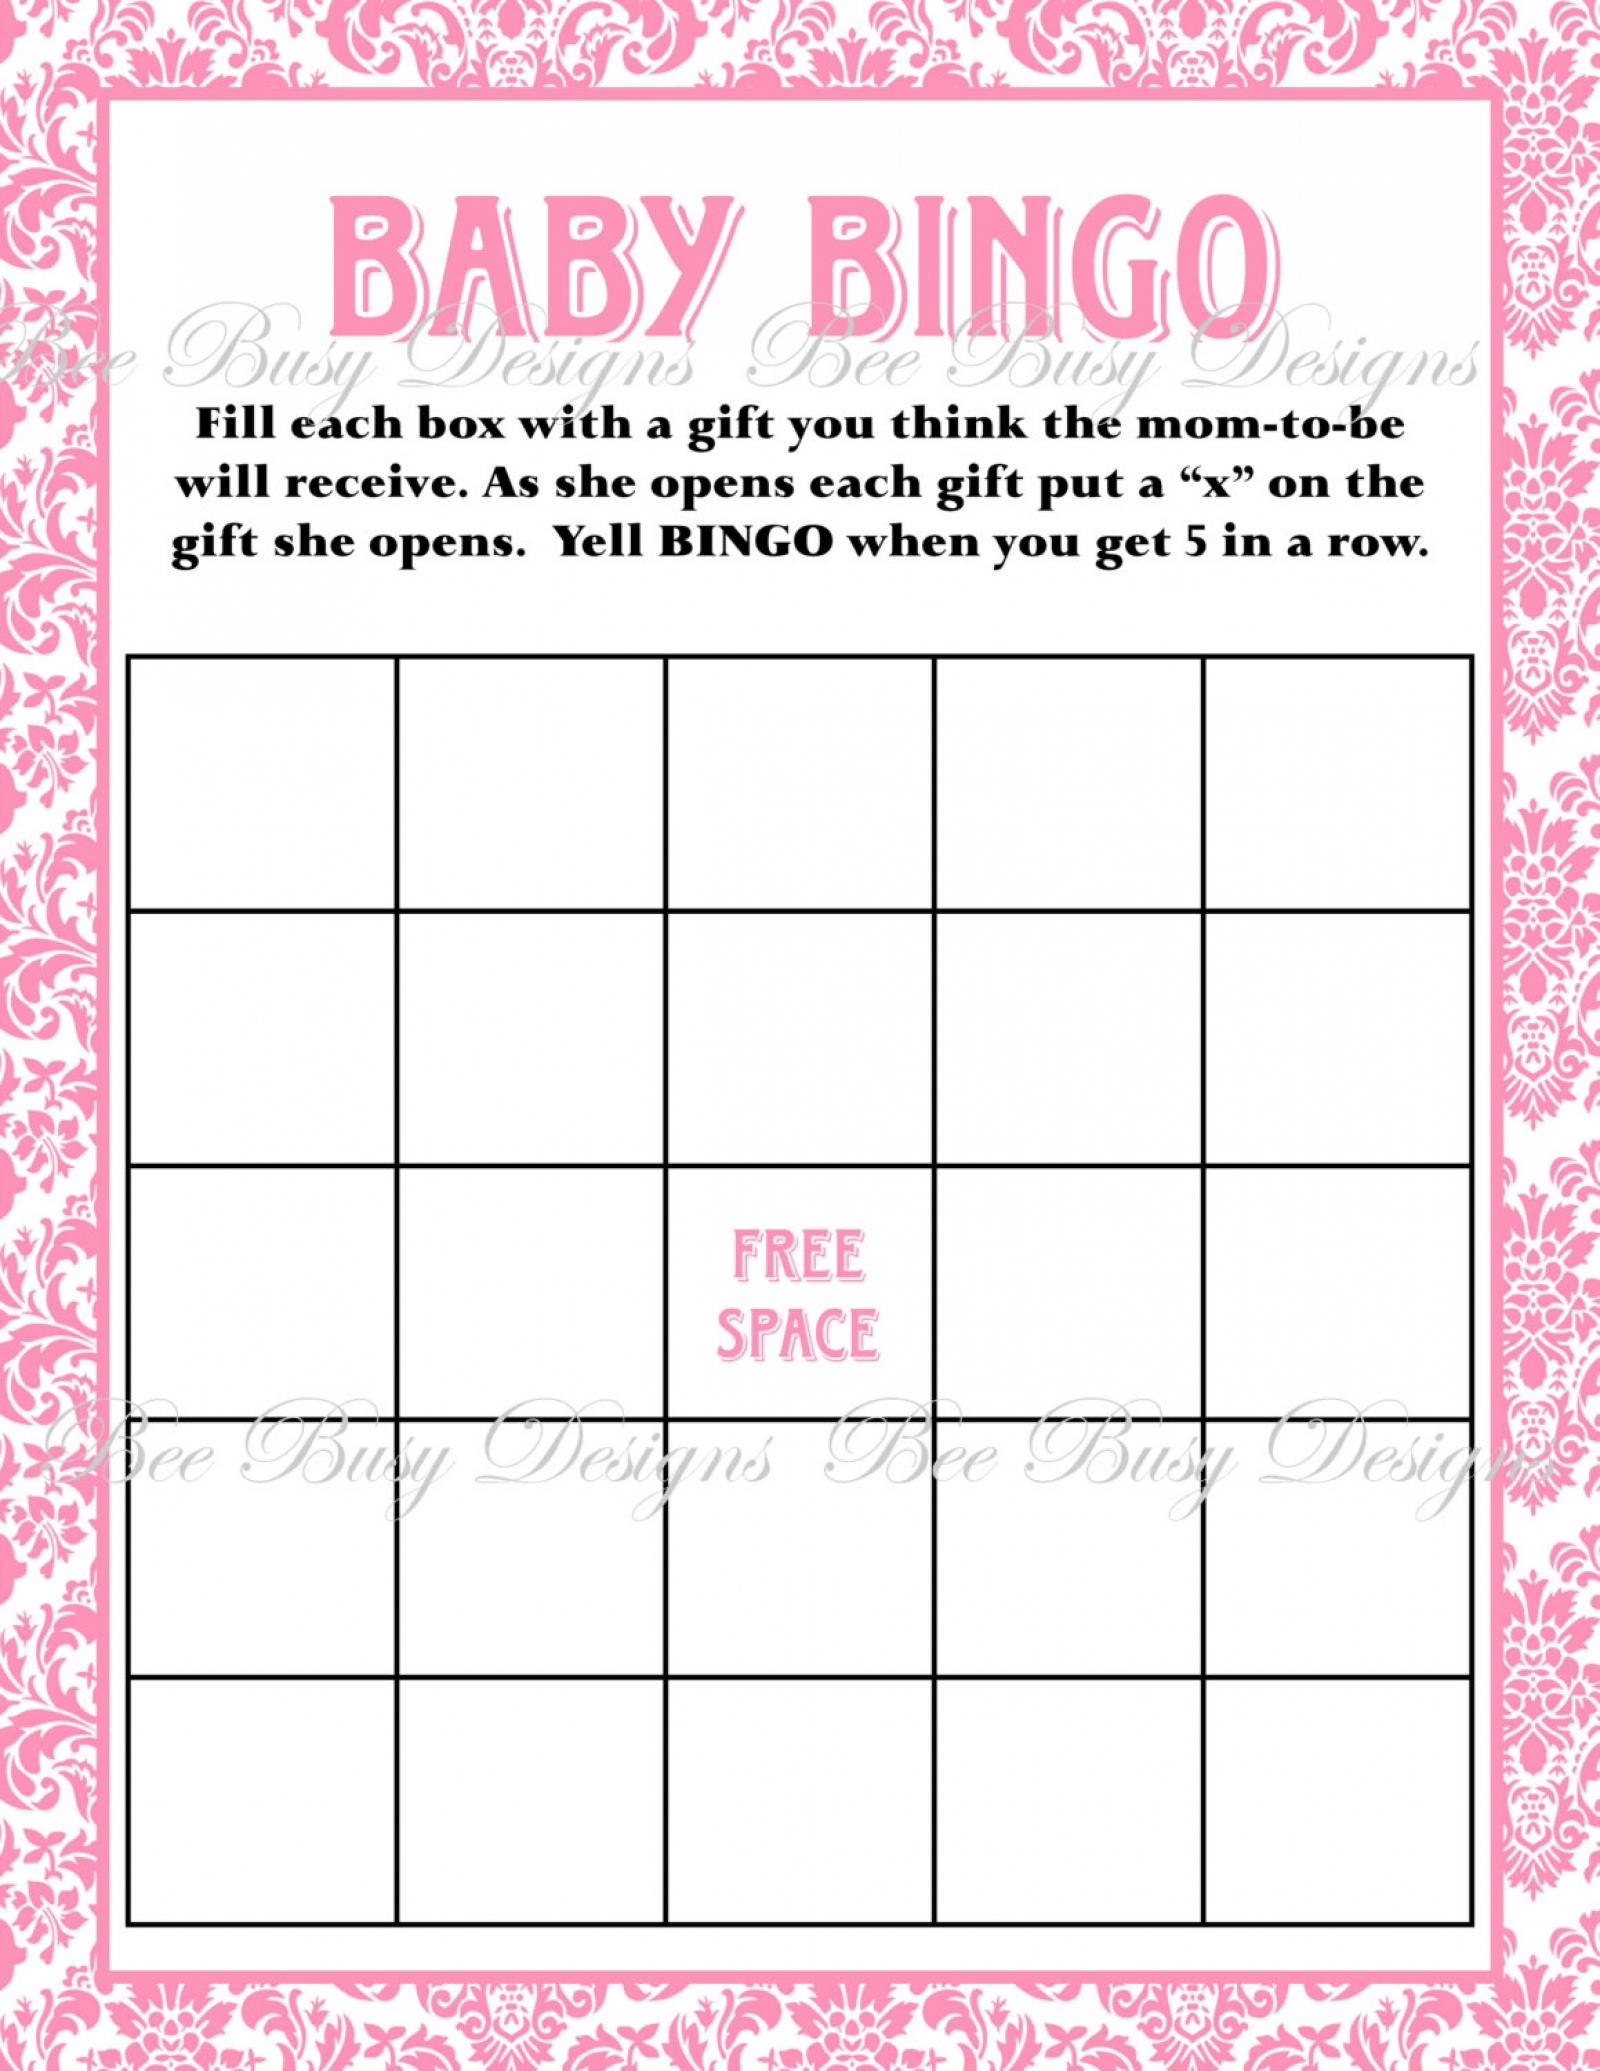 Printable Pink Damask Baby Shower Bingo Game Instant Download | Bee - Free Printable Baby Shower Bingo Cards